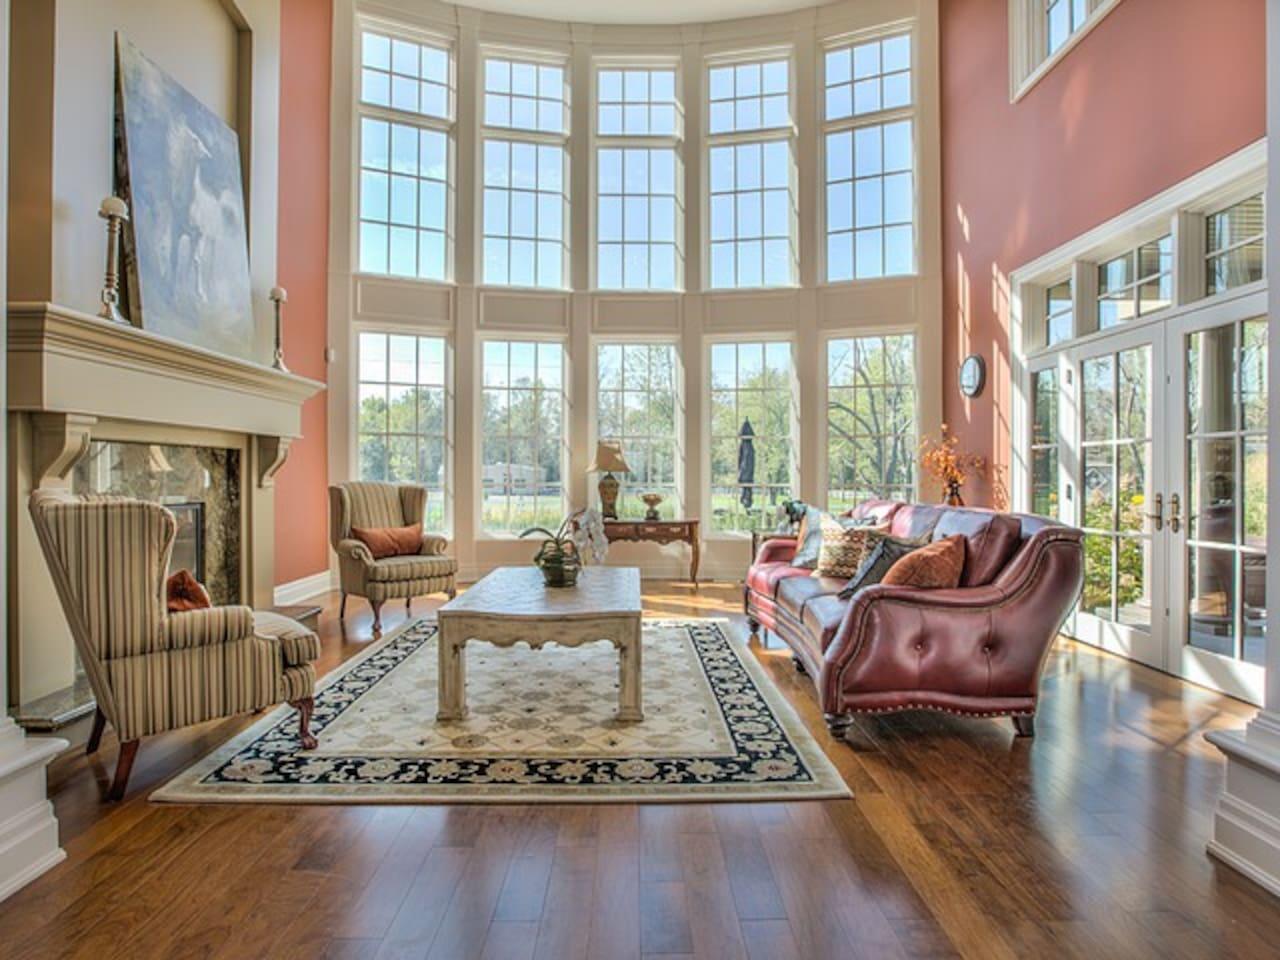 Living Room with beautiful sunshine